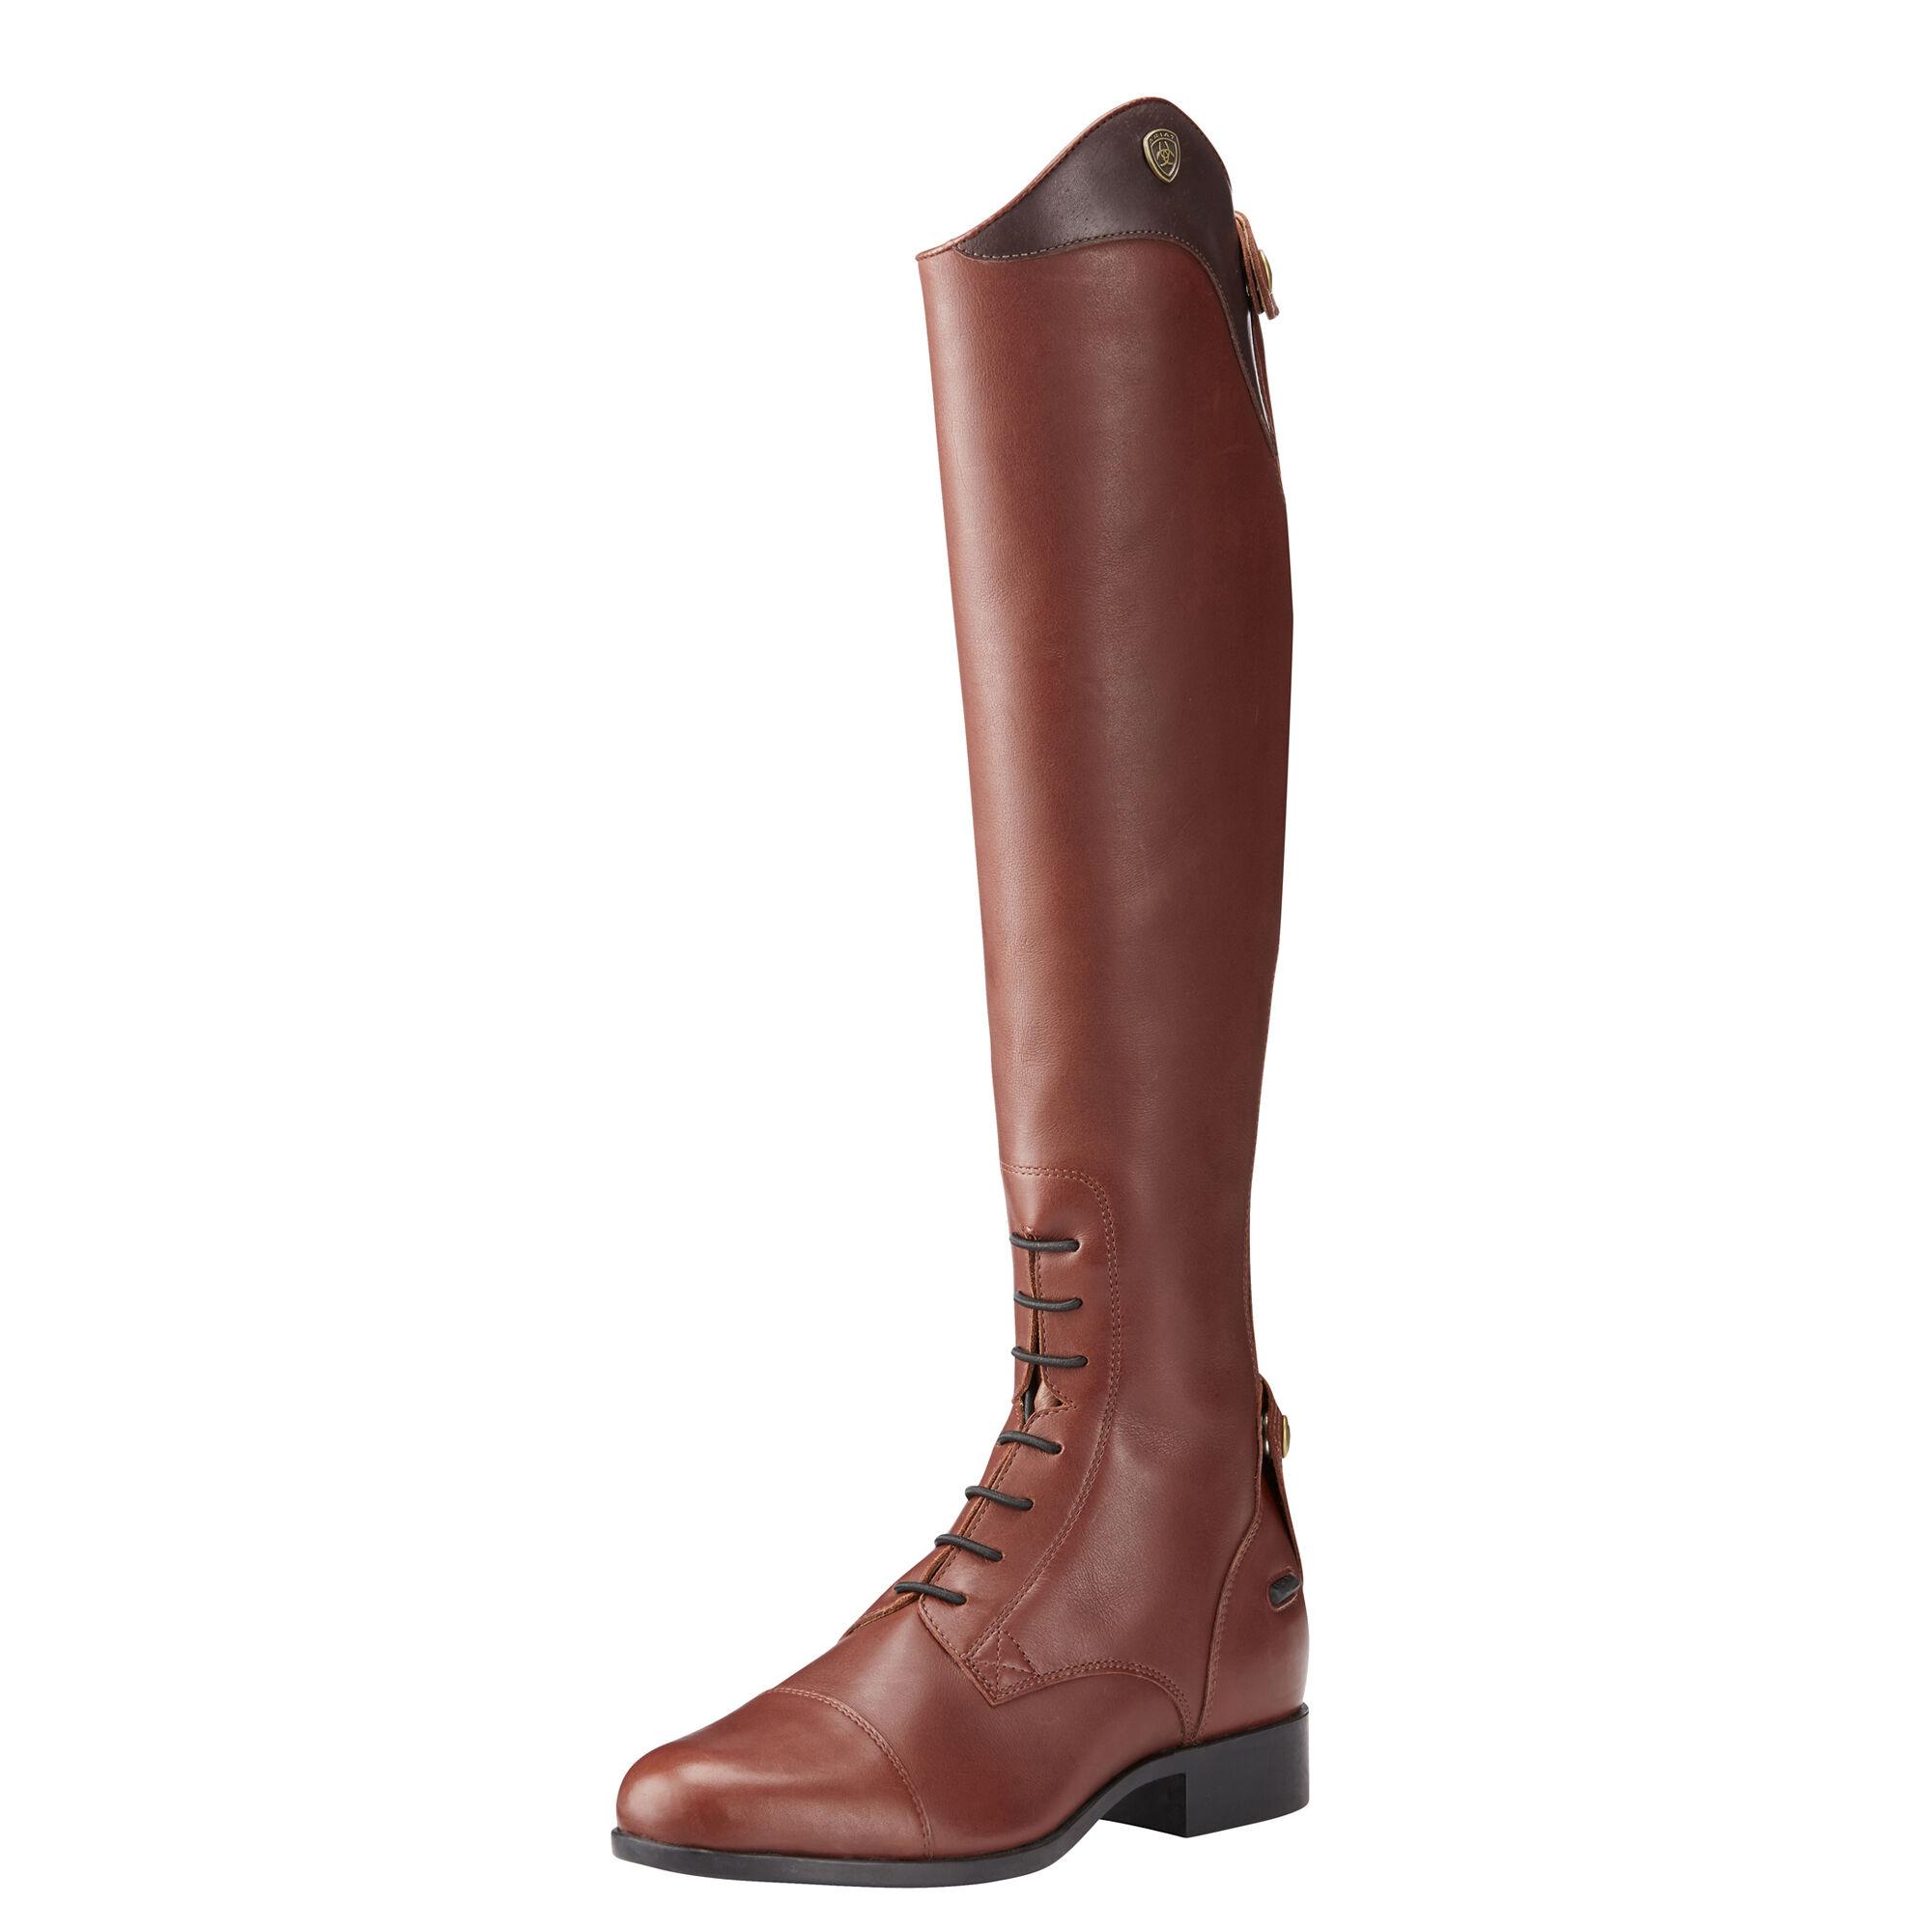 Heritage Ii Ellipse Tall Riding Boot